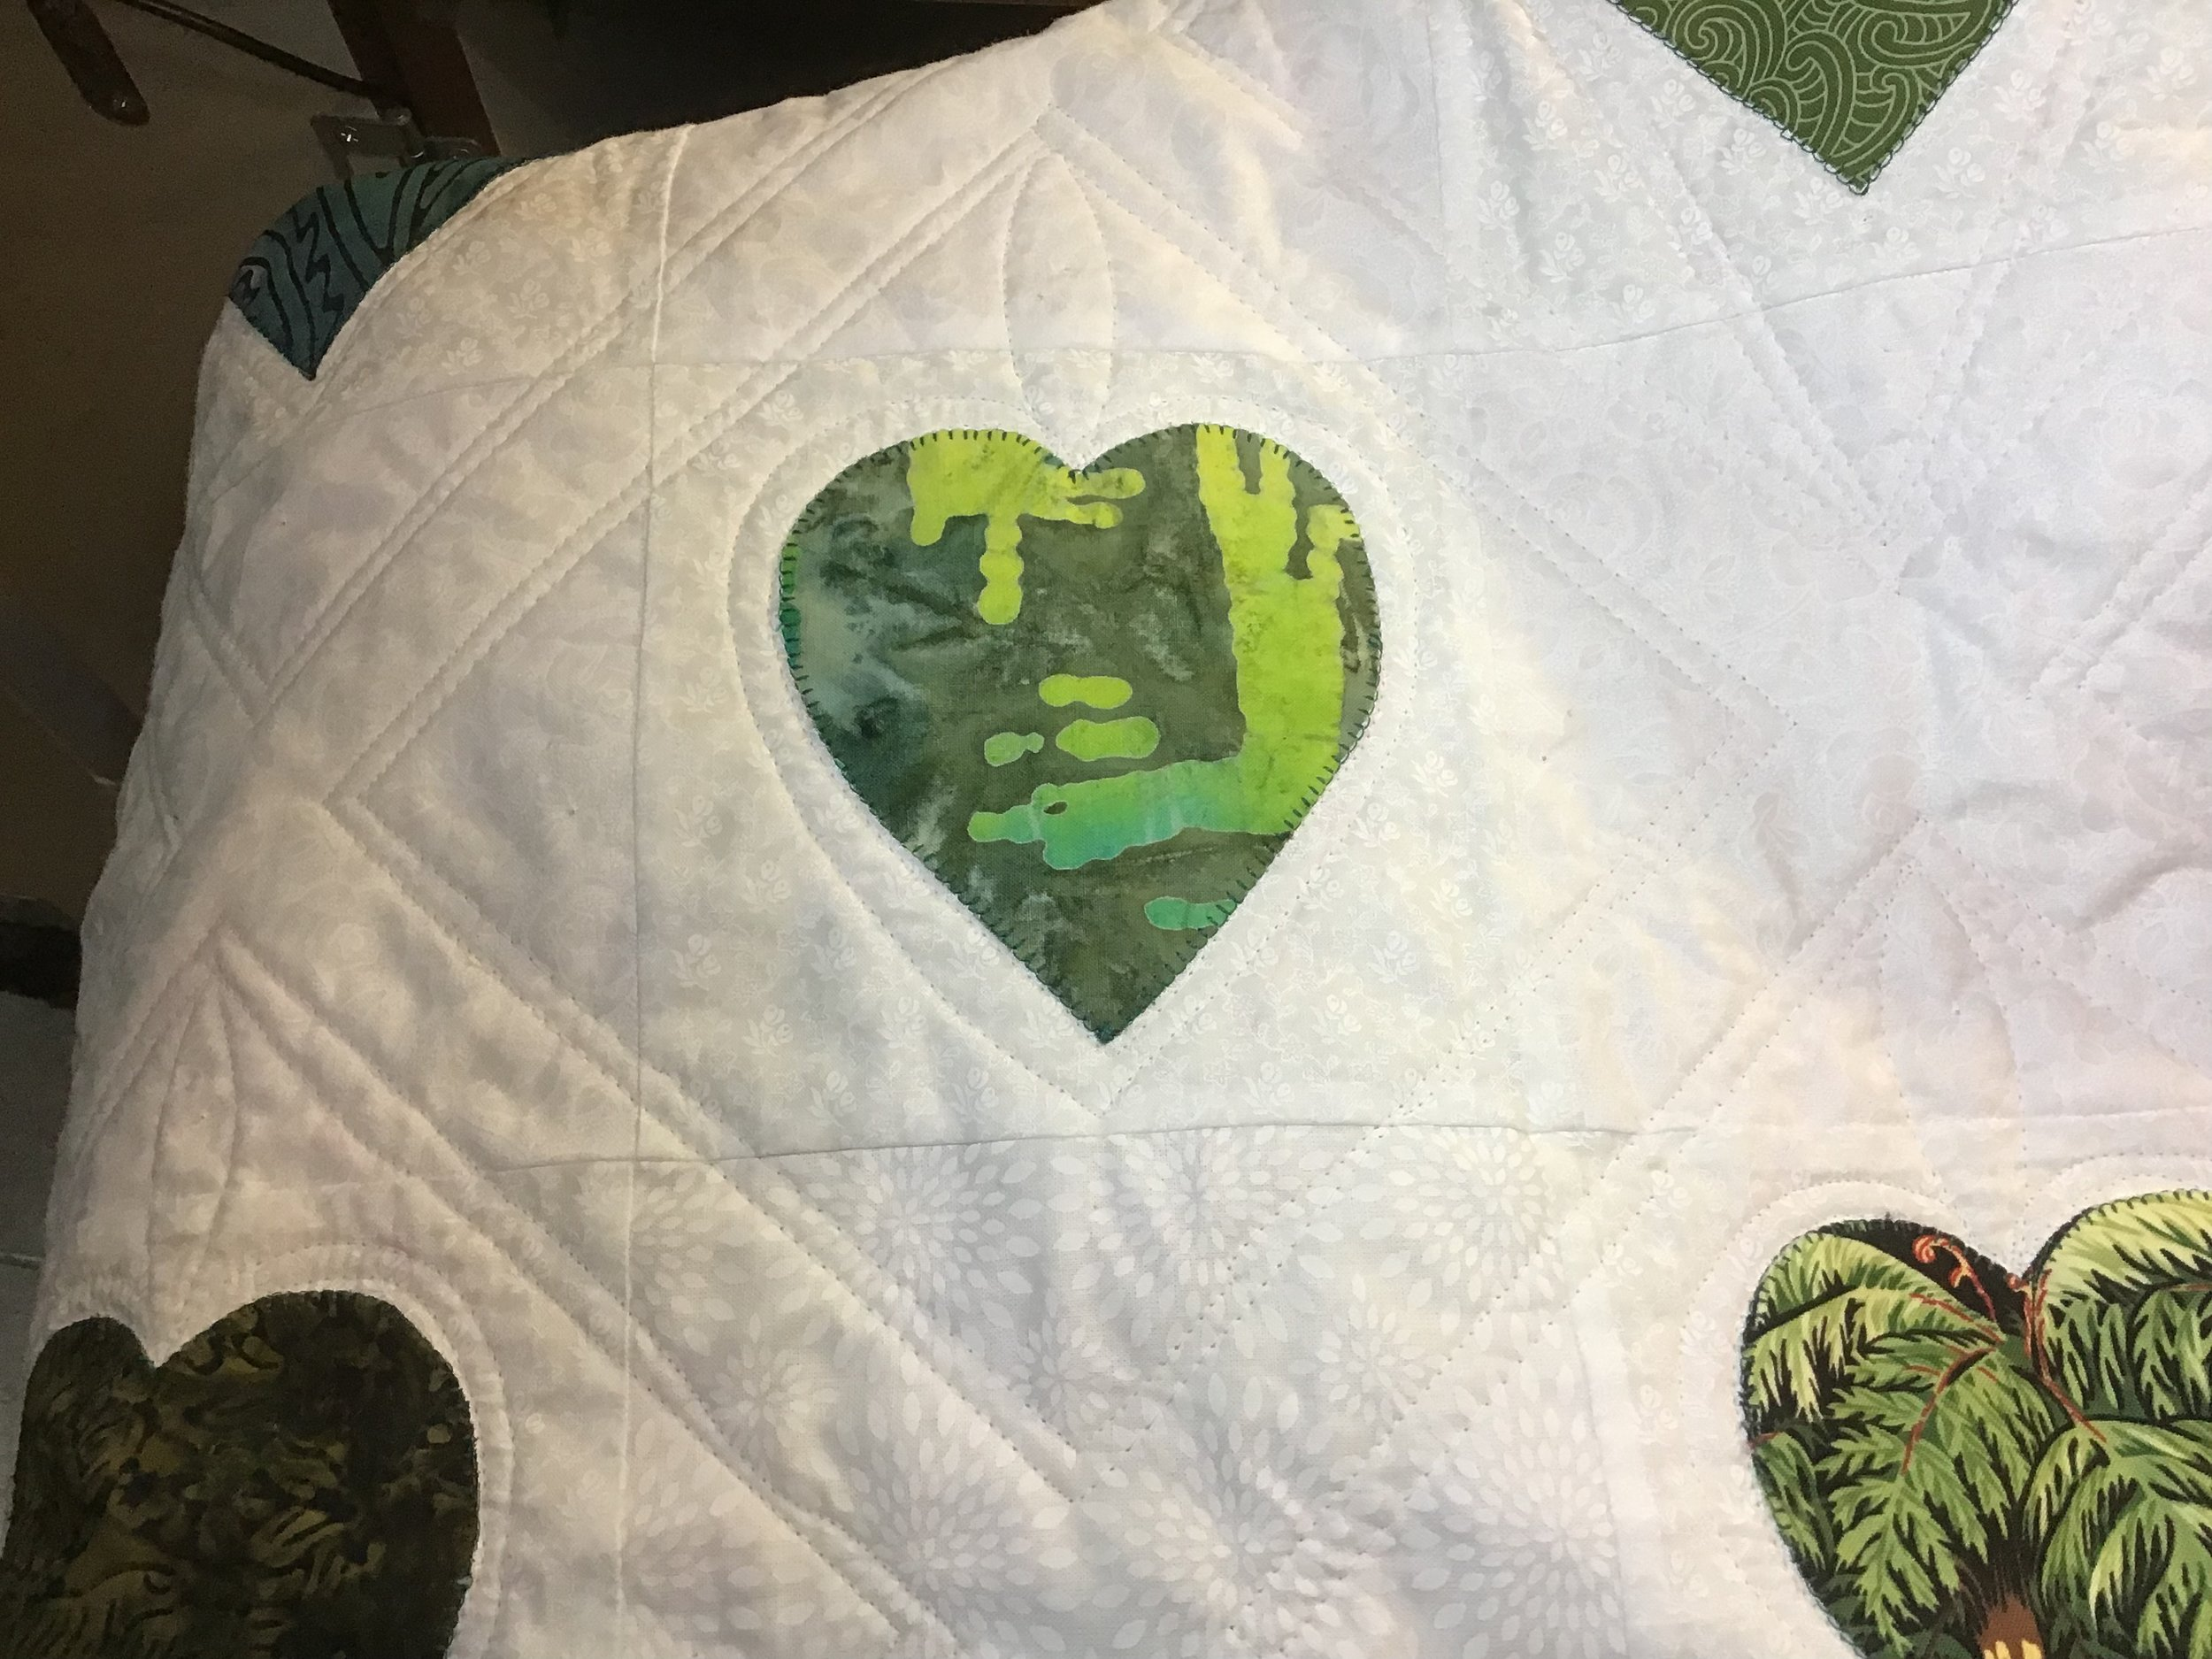 green appliquéd heart for 'healing hearts for Christchurch'